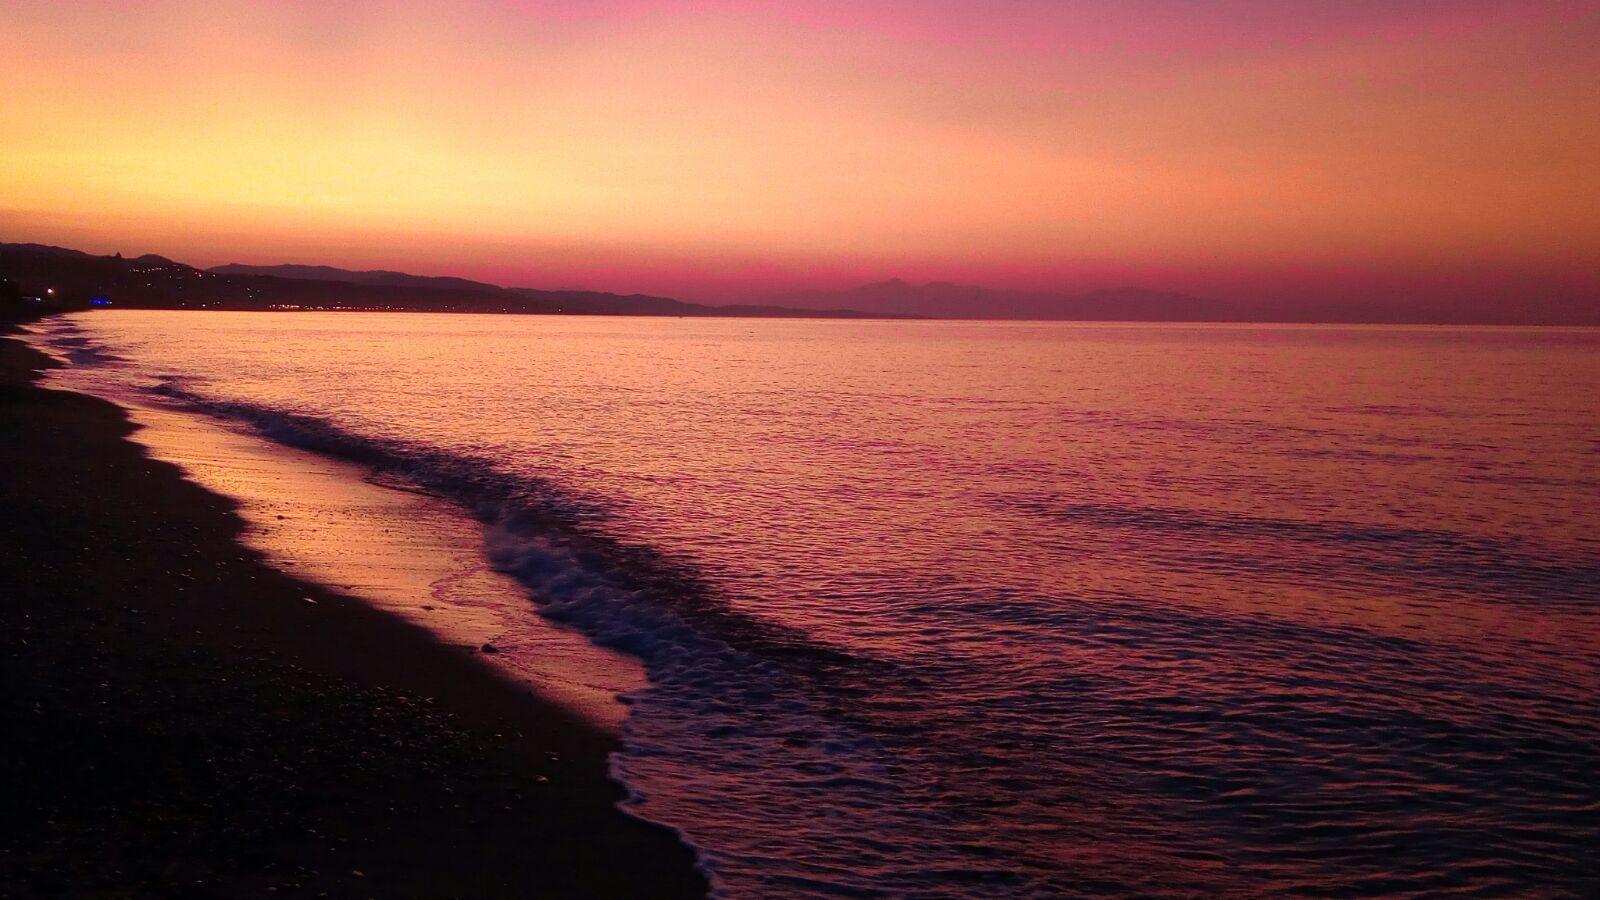 tramonti fantastici